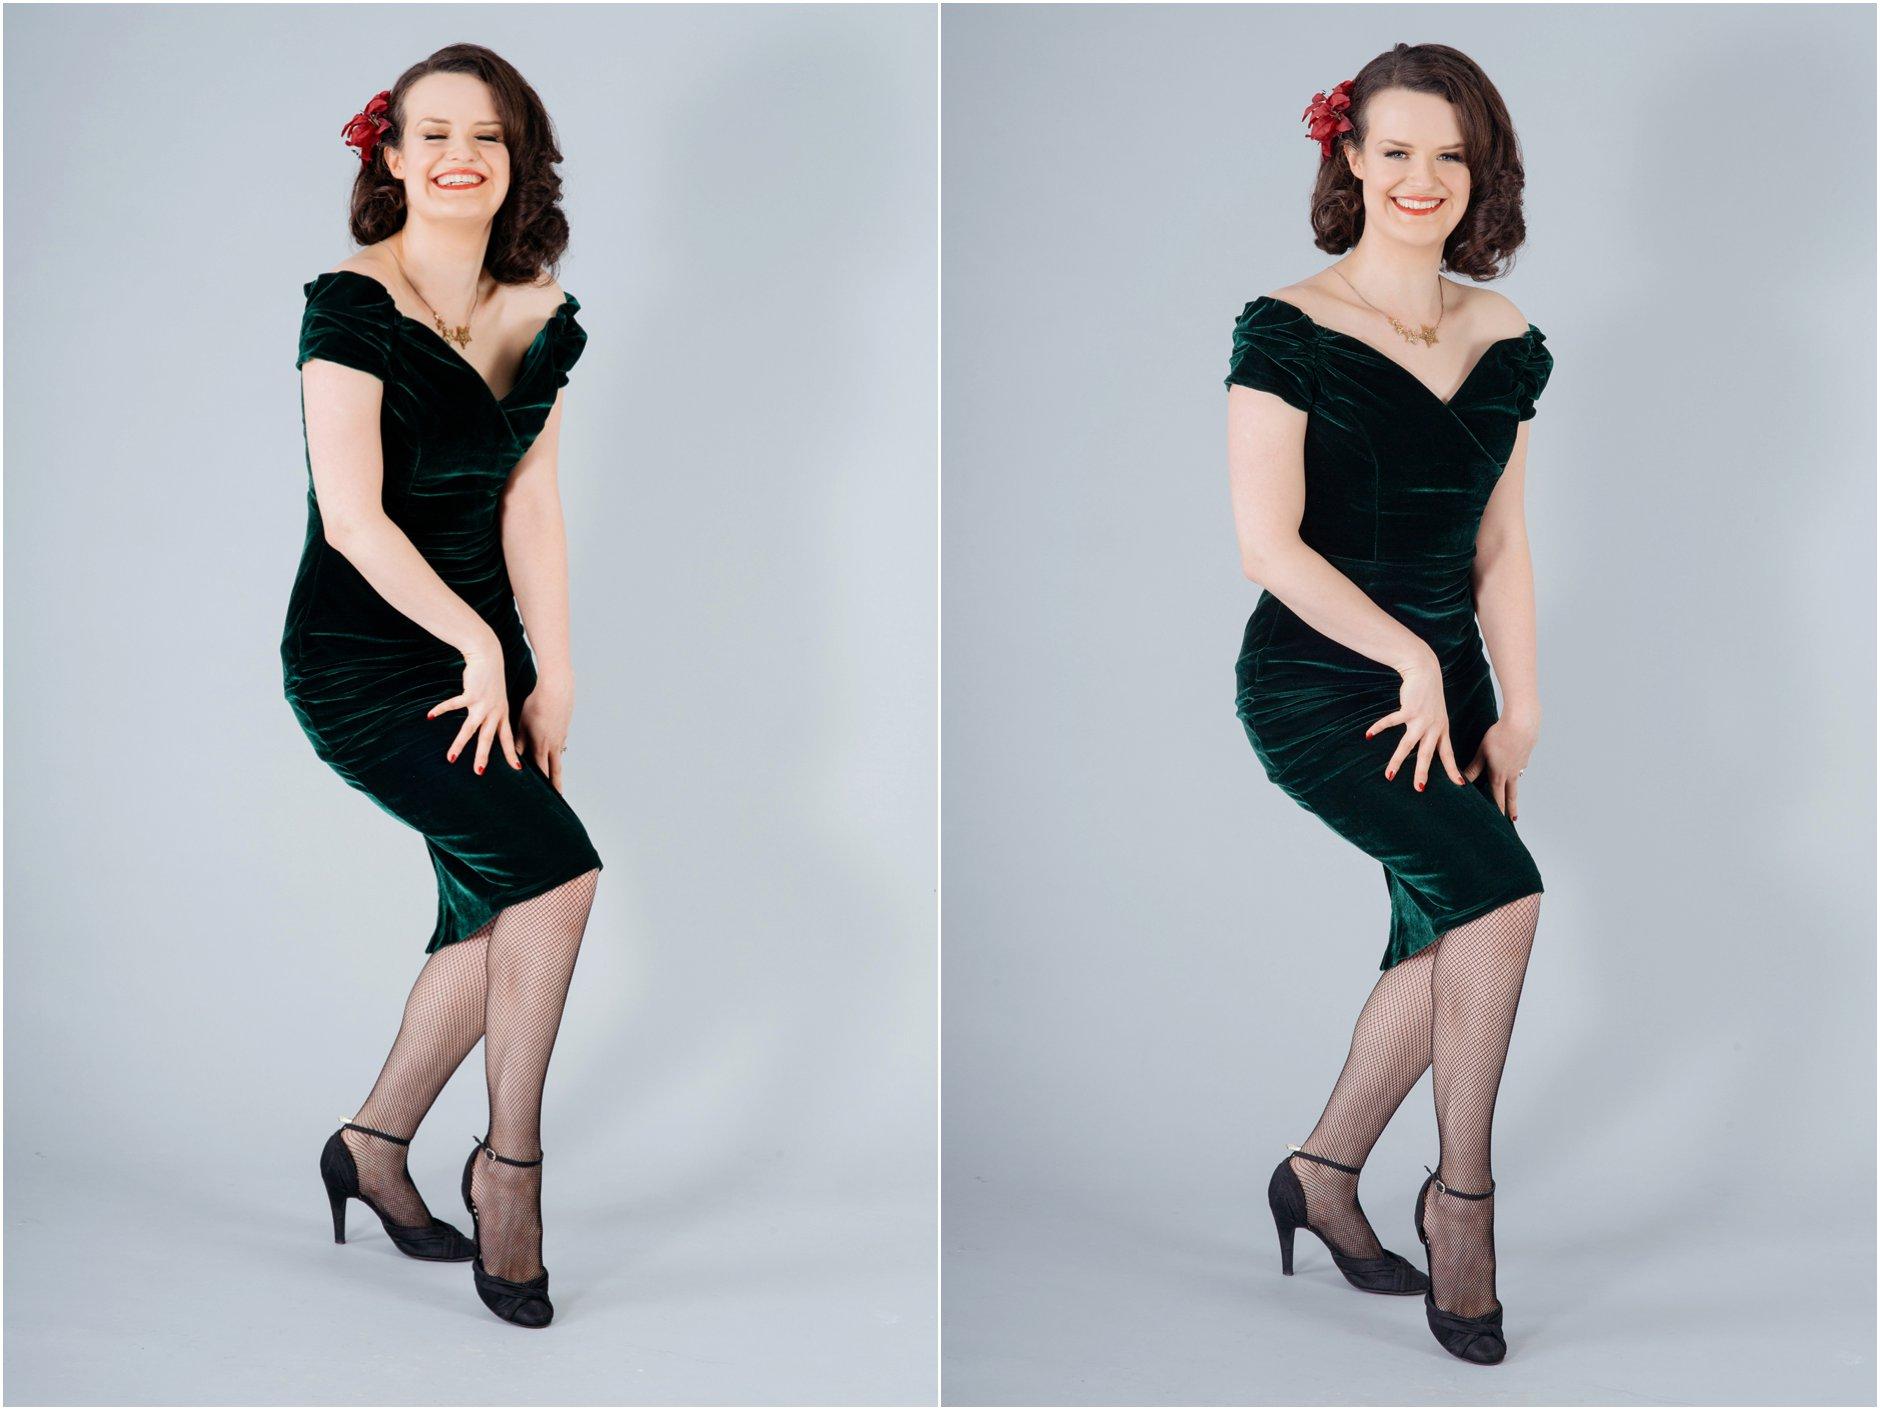 edinburgh burlesque boudoir pinup female photographer photography